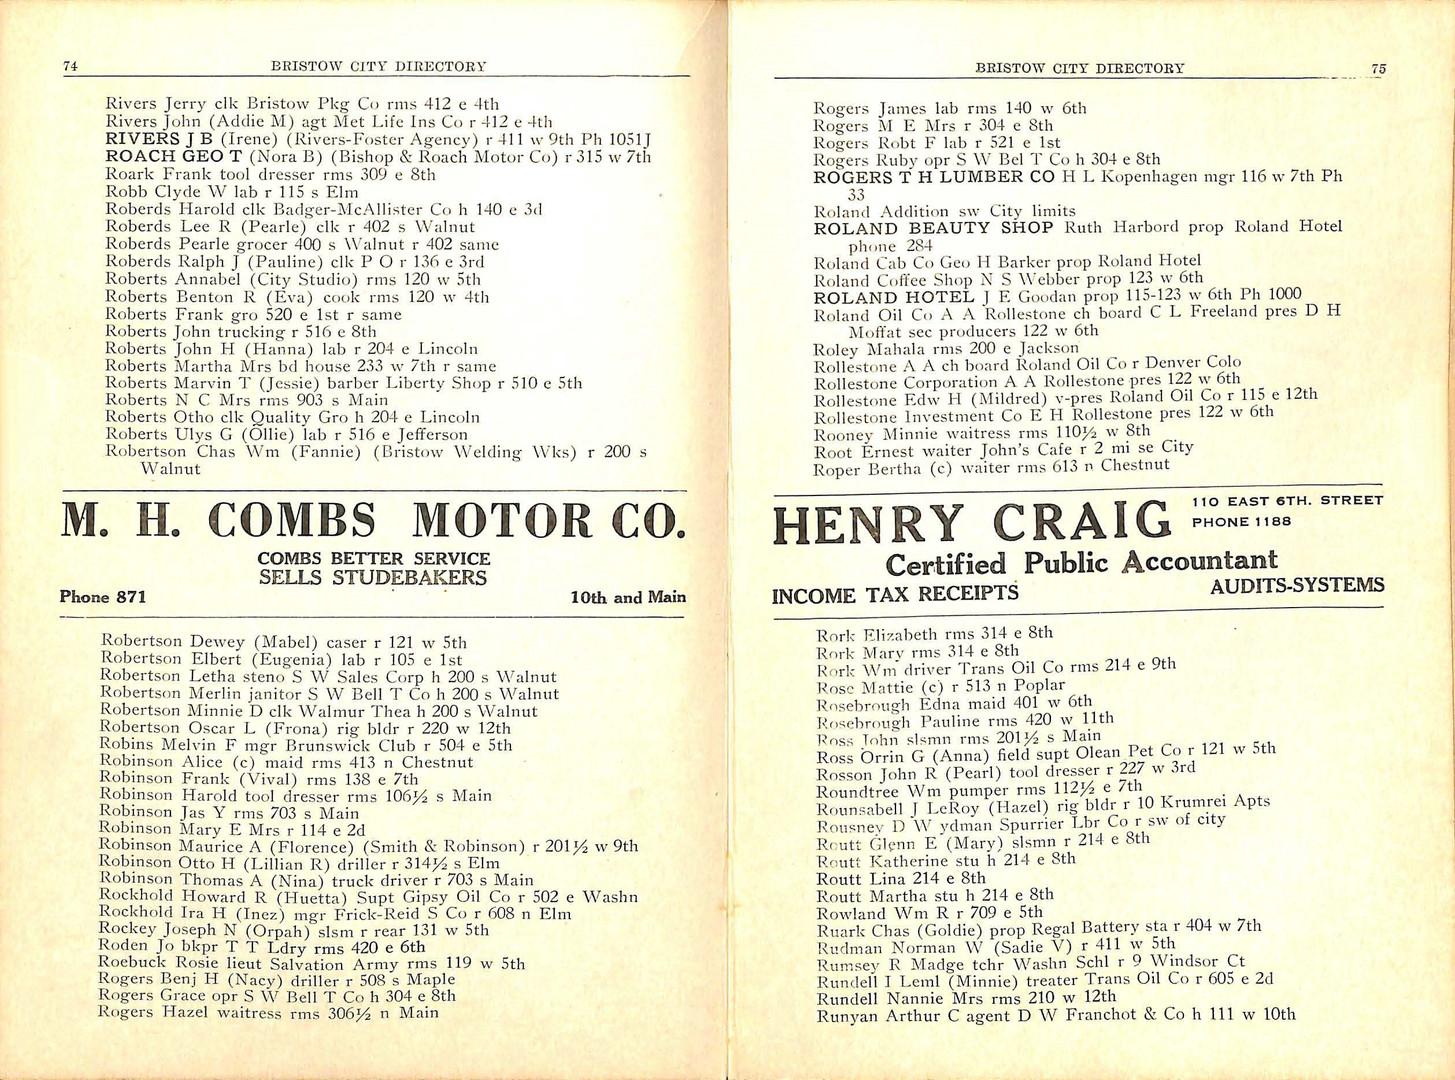 Bristow City Directory 1926_039.jpg